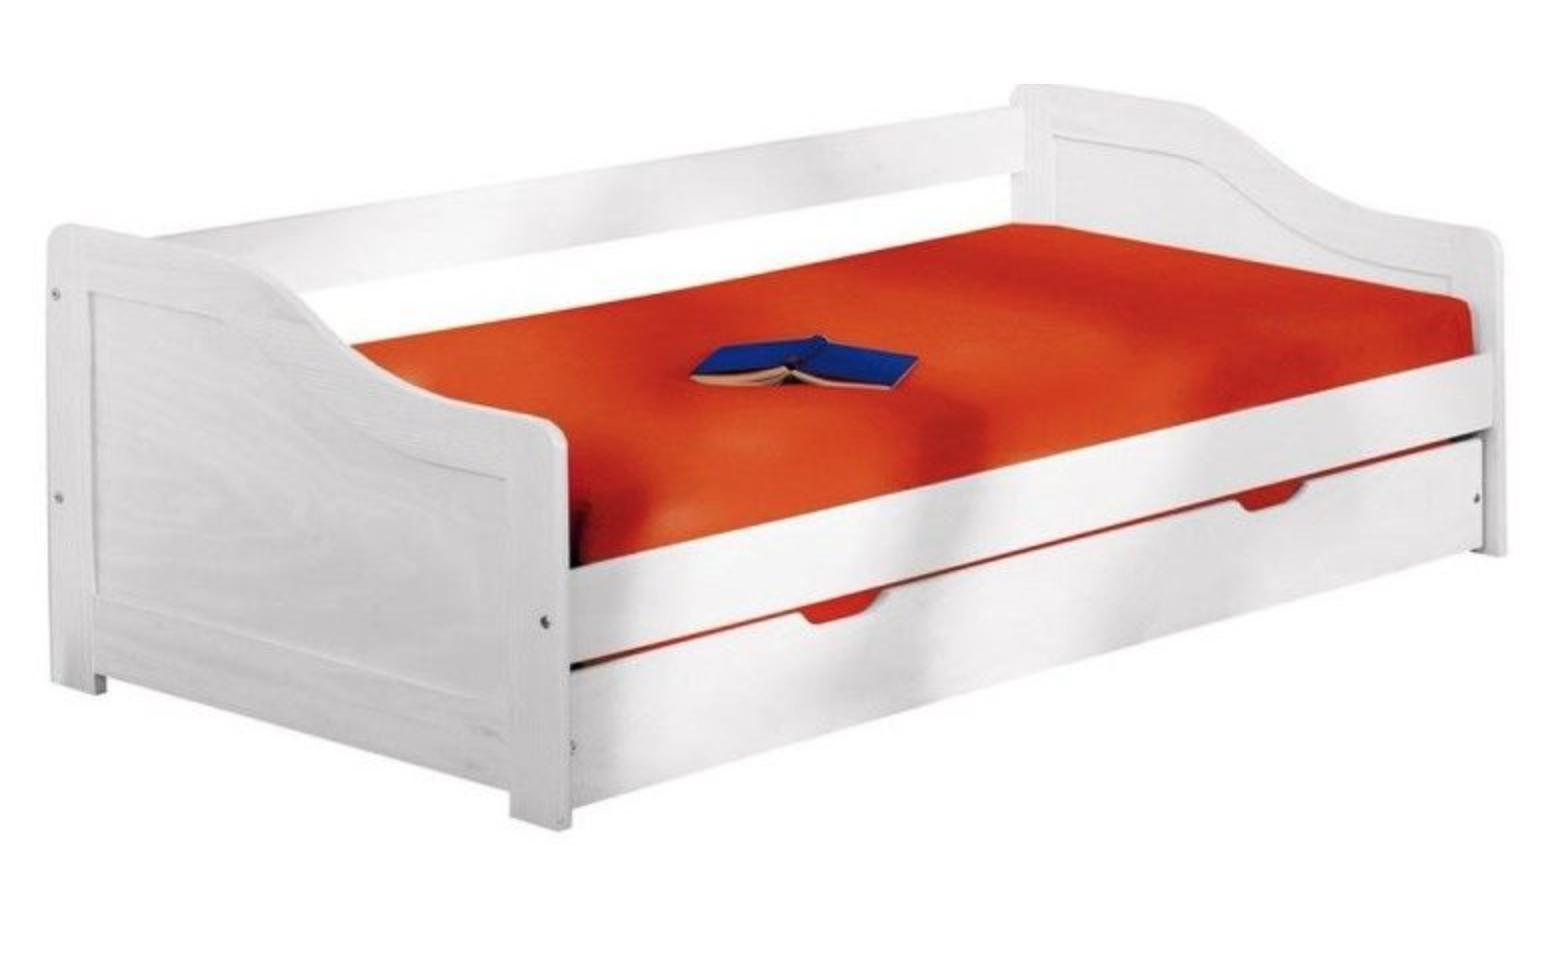 lit banquette pin massif blanc l o 90. Black Bedroom Furniture Sets. Home Design Ideas